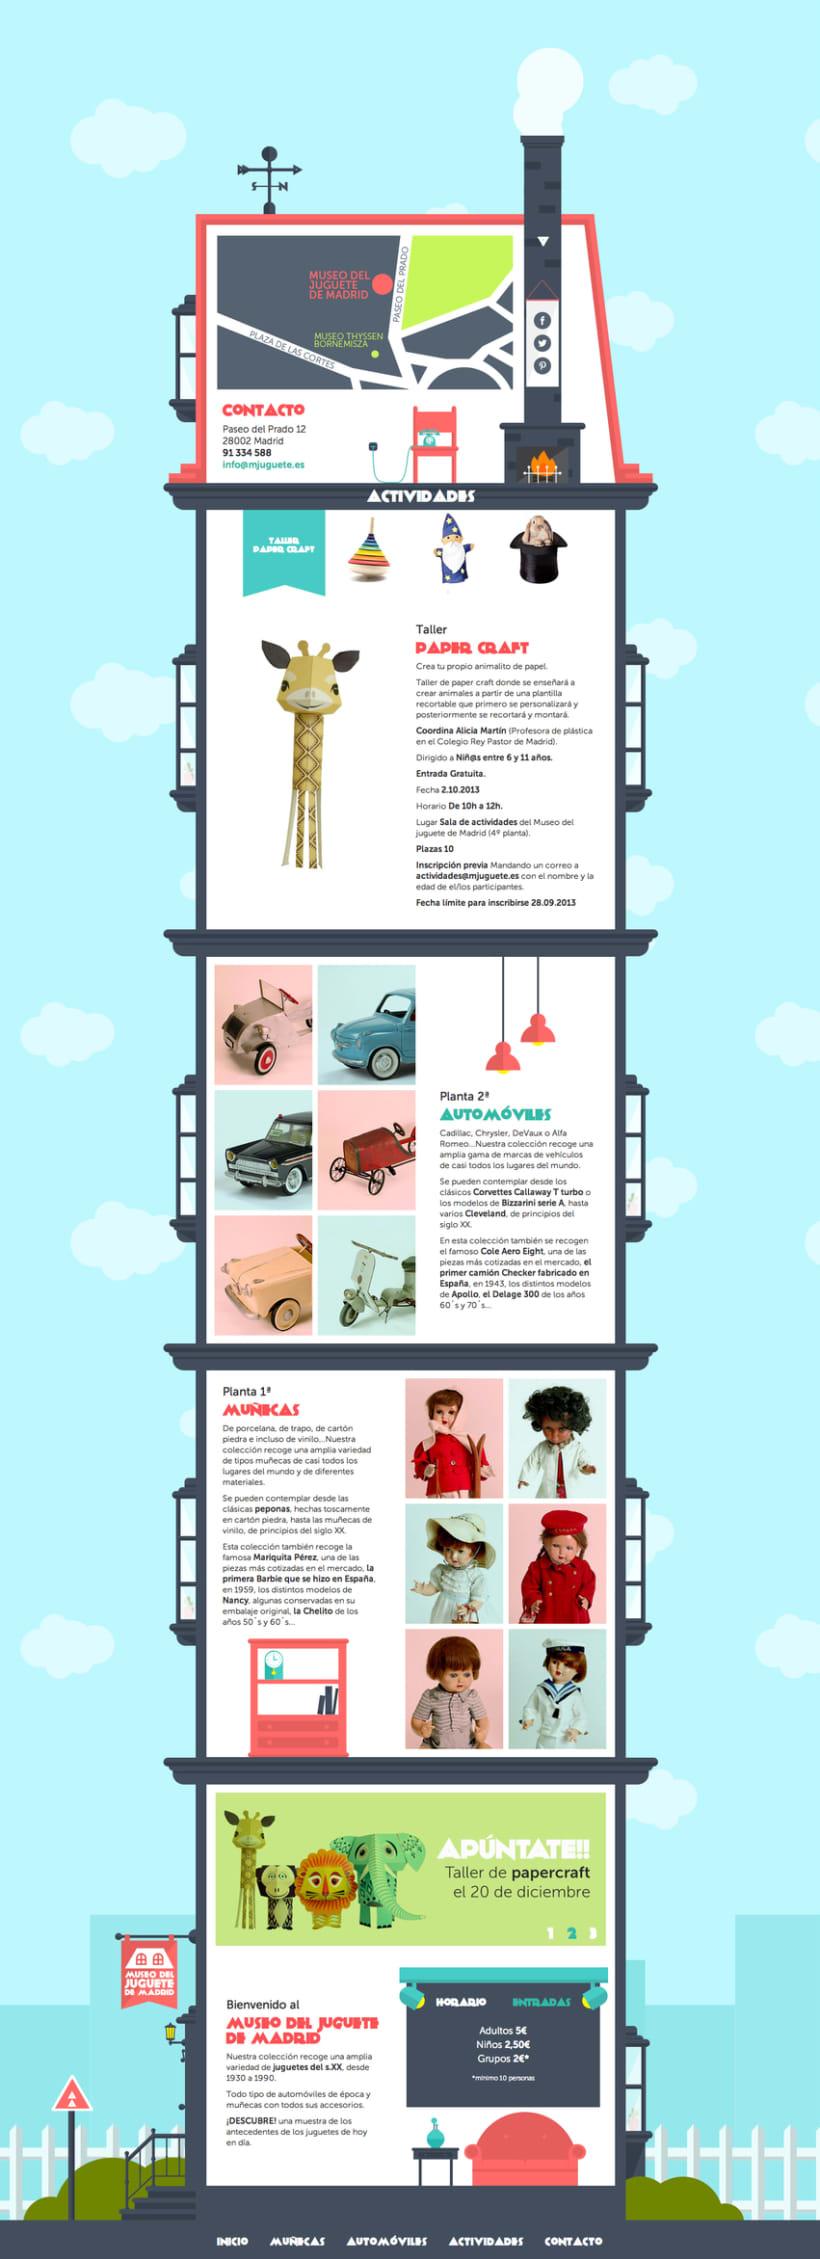 Museo del juguete de Madrid (personal web project) 2